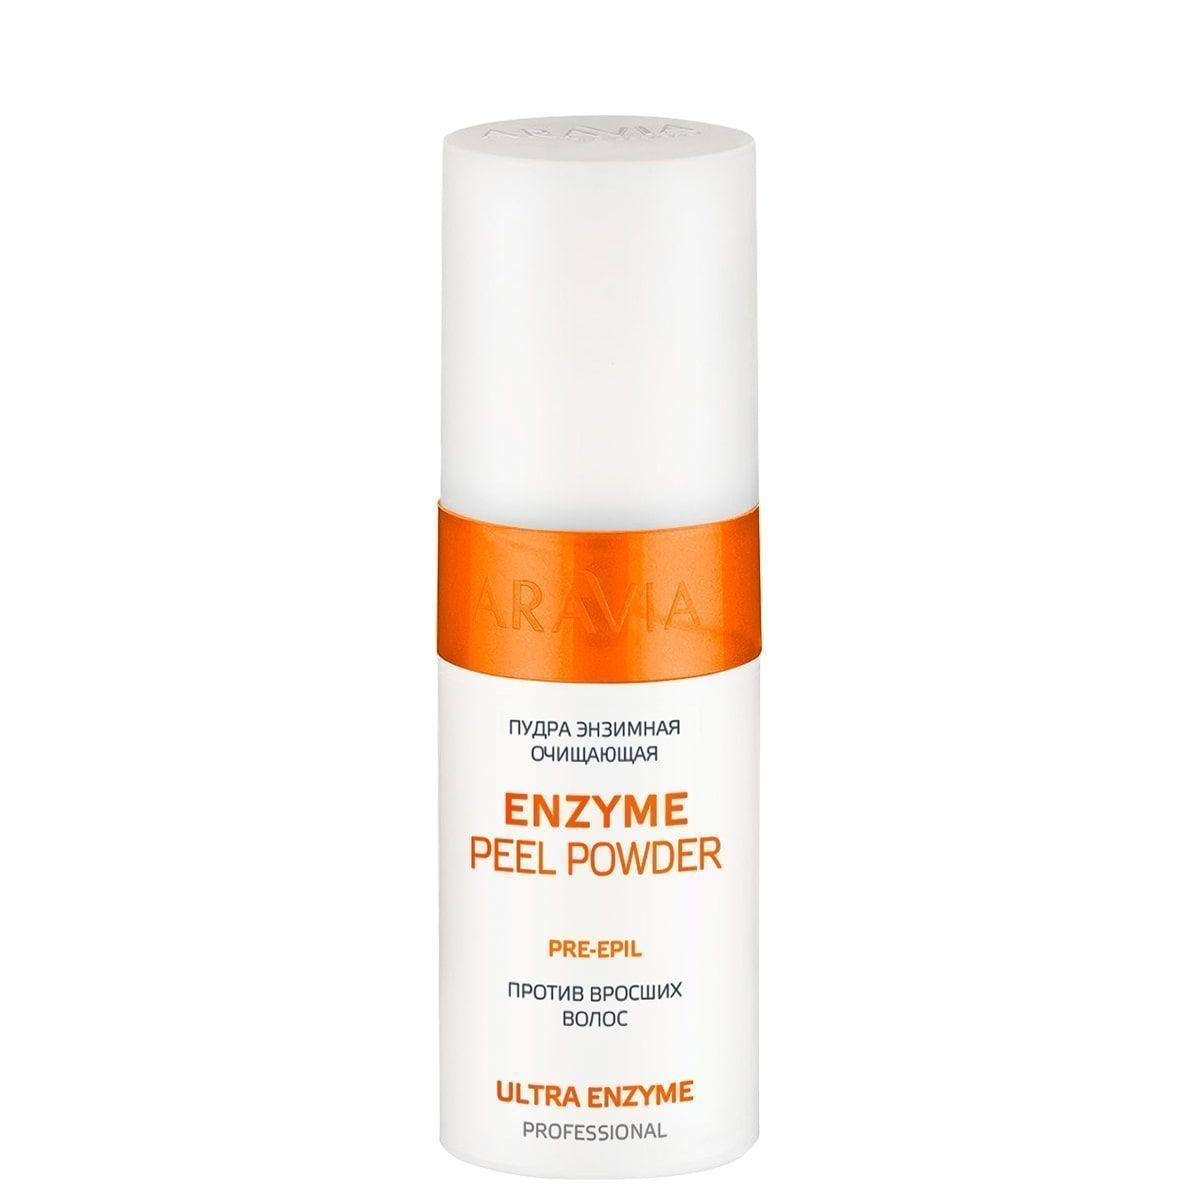 ARAVIA Пудра Энзимная Очищающая против Вросших Волос Enzyme Peel-Powder, 150 мл